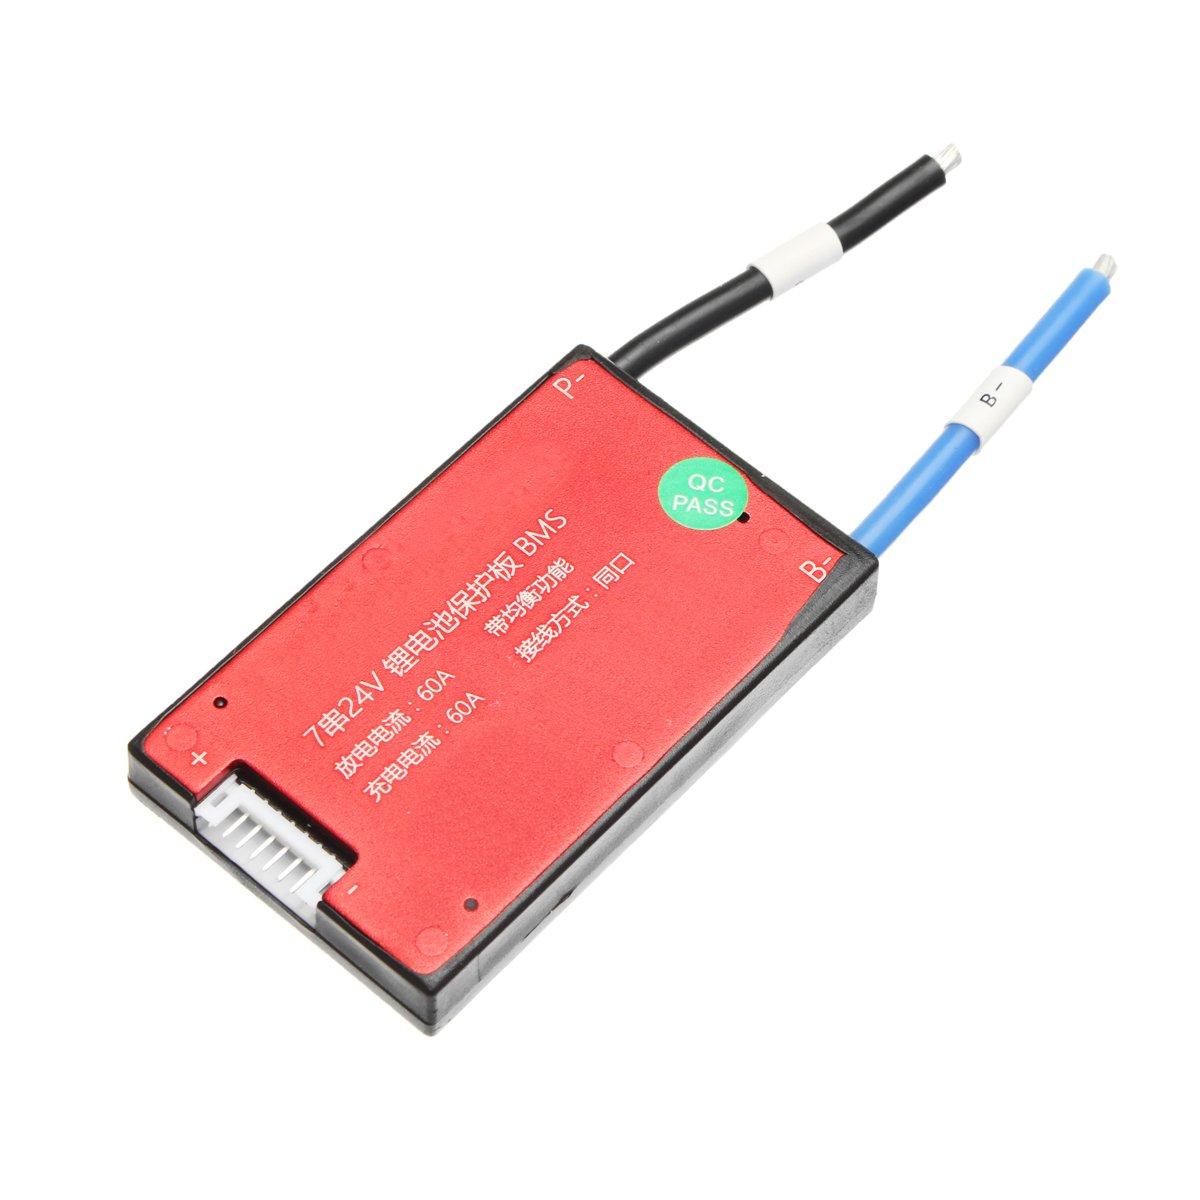 16a ChaRLes 24 V 7 S 16//25//35//45//60 A Bms Pcb Batterie Schutz Bord F/ür Ebike Elektro Fahrrad